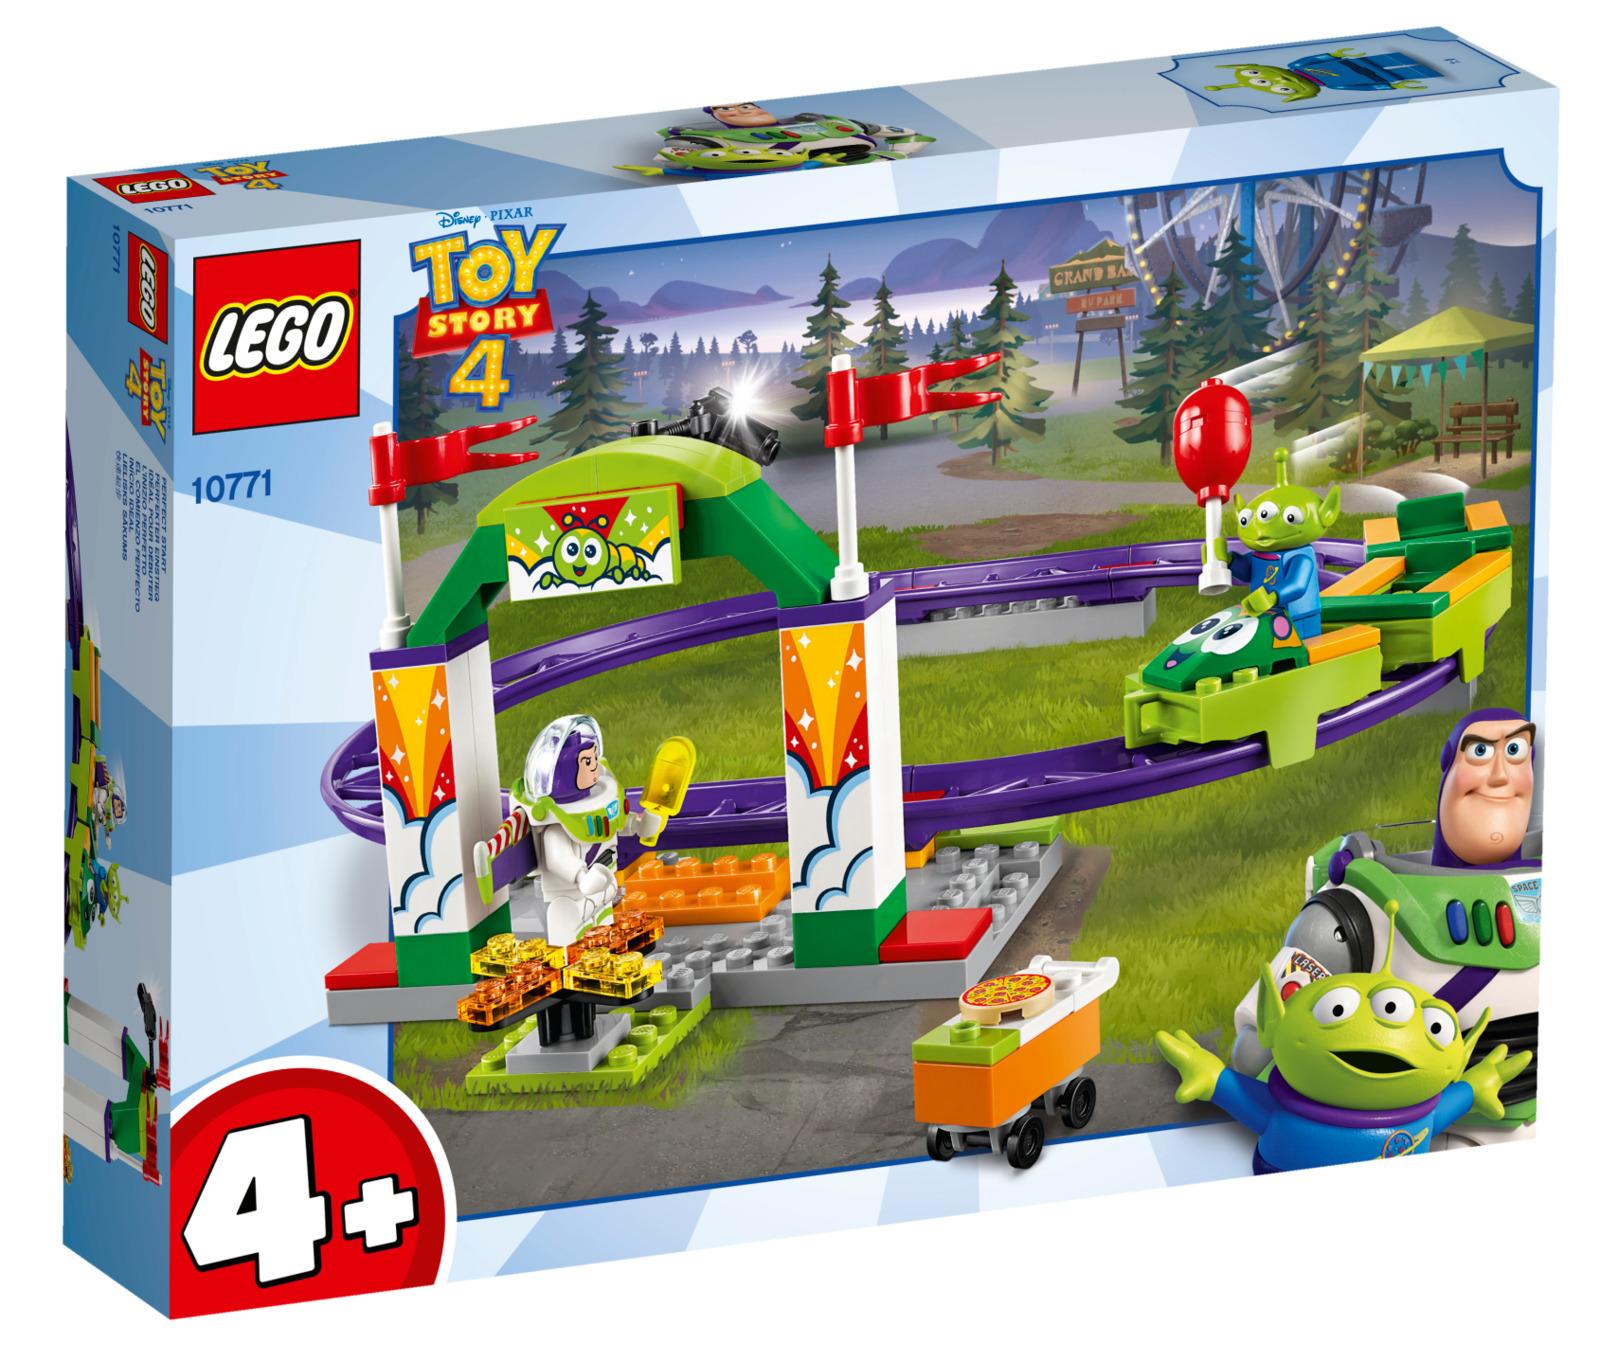 LEGO Disney: Toy Story Carnival Thrill Coaster - (10771) image